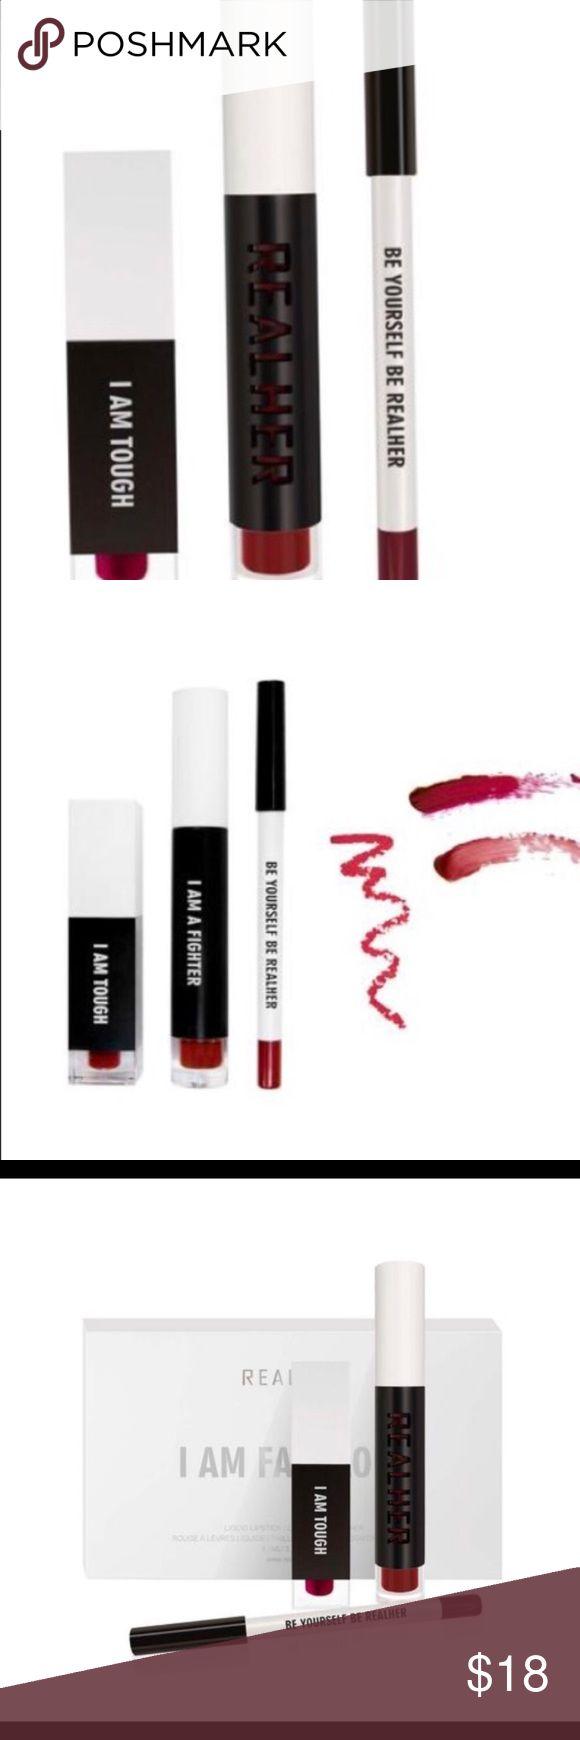 Realher lipstick set nwt I am fabulous deep red New un opened! Realher I am fabulous in deep red Specially Made, Most Popular Lip Kit contains a Matte Liquid Lipstick, Lip Plumping Lip Gloss and a Lip Liner  Size LIQUID LIPSTICK:4.5ML, LIP GLOSS: 3.5ML,  LIP LINER: 1.2G Sephora Makeup Lipstick